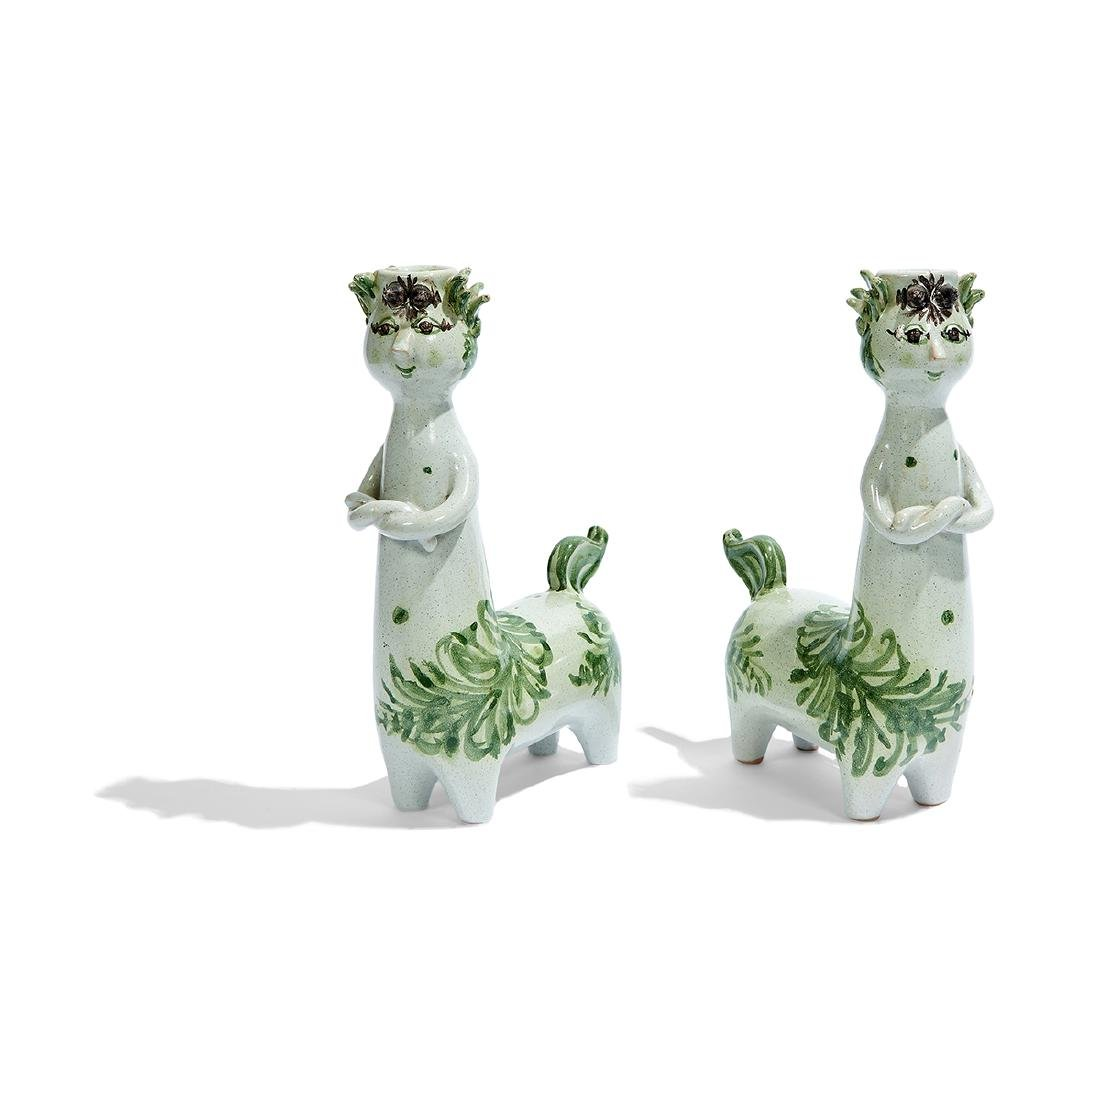 Bjorn Wiinblad Centaur candlesticks, pair